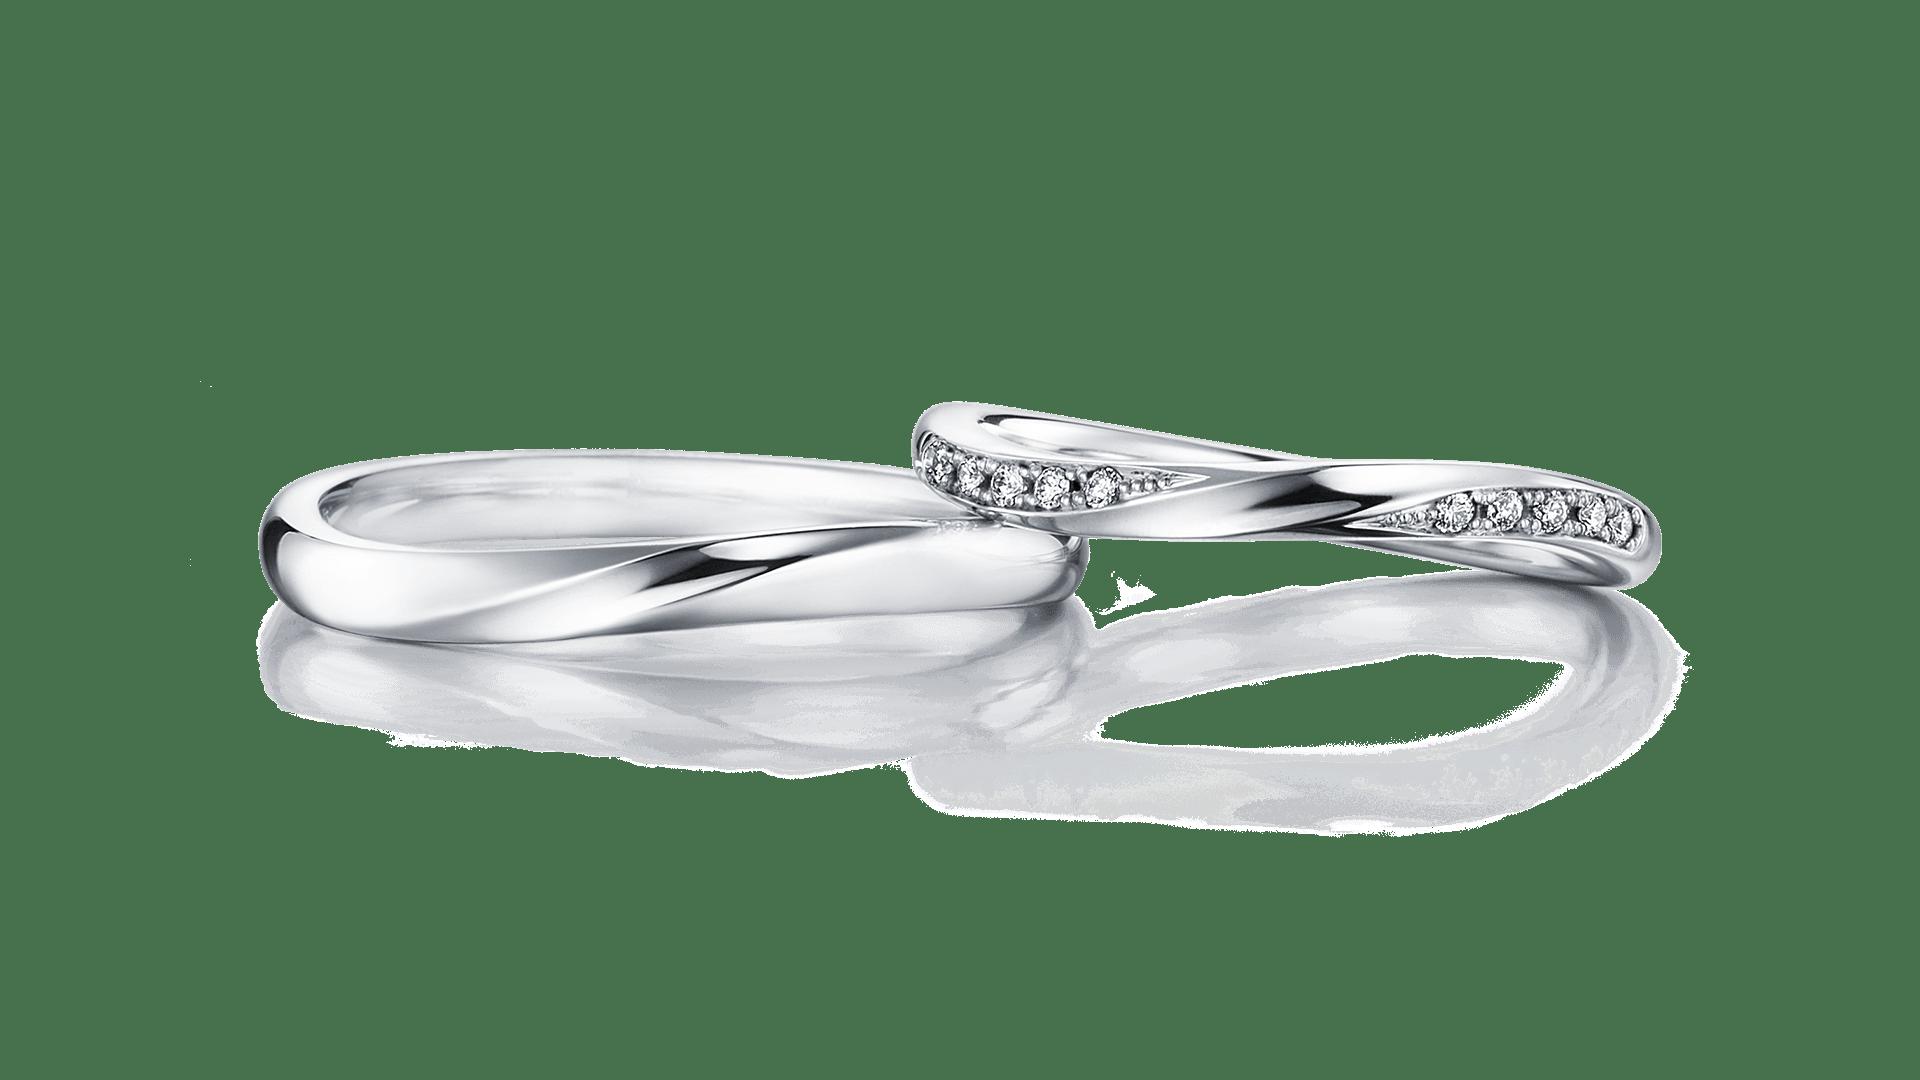 perseus ペルセウス | 結婚指輪サムネイル 1